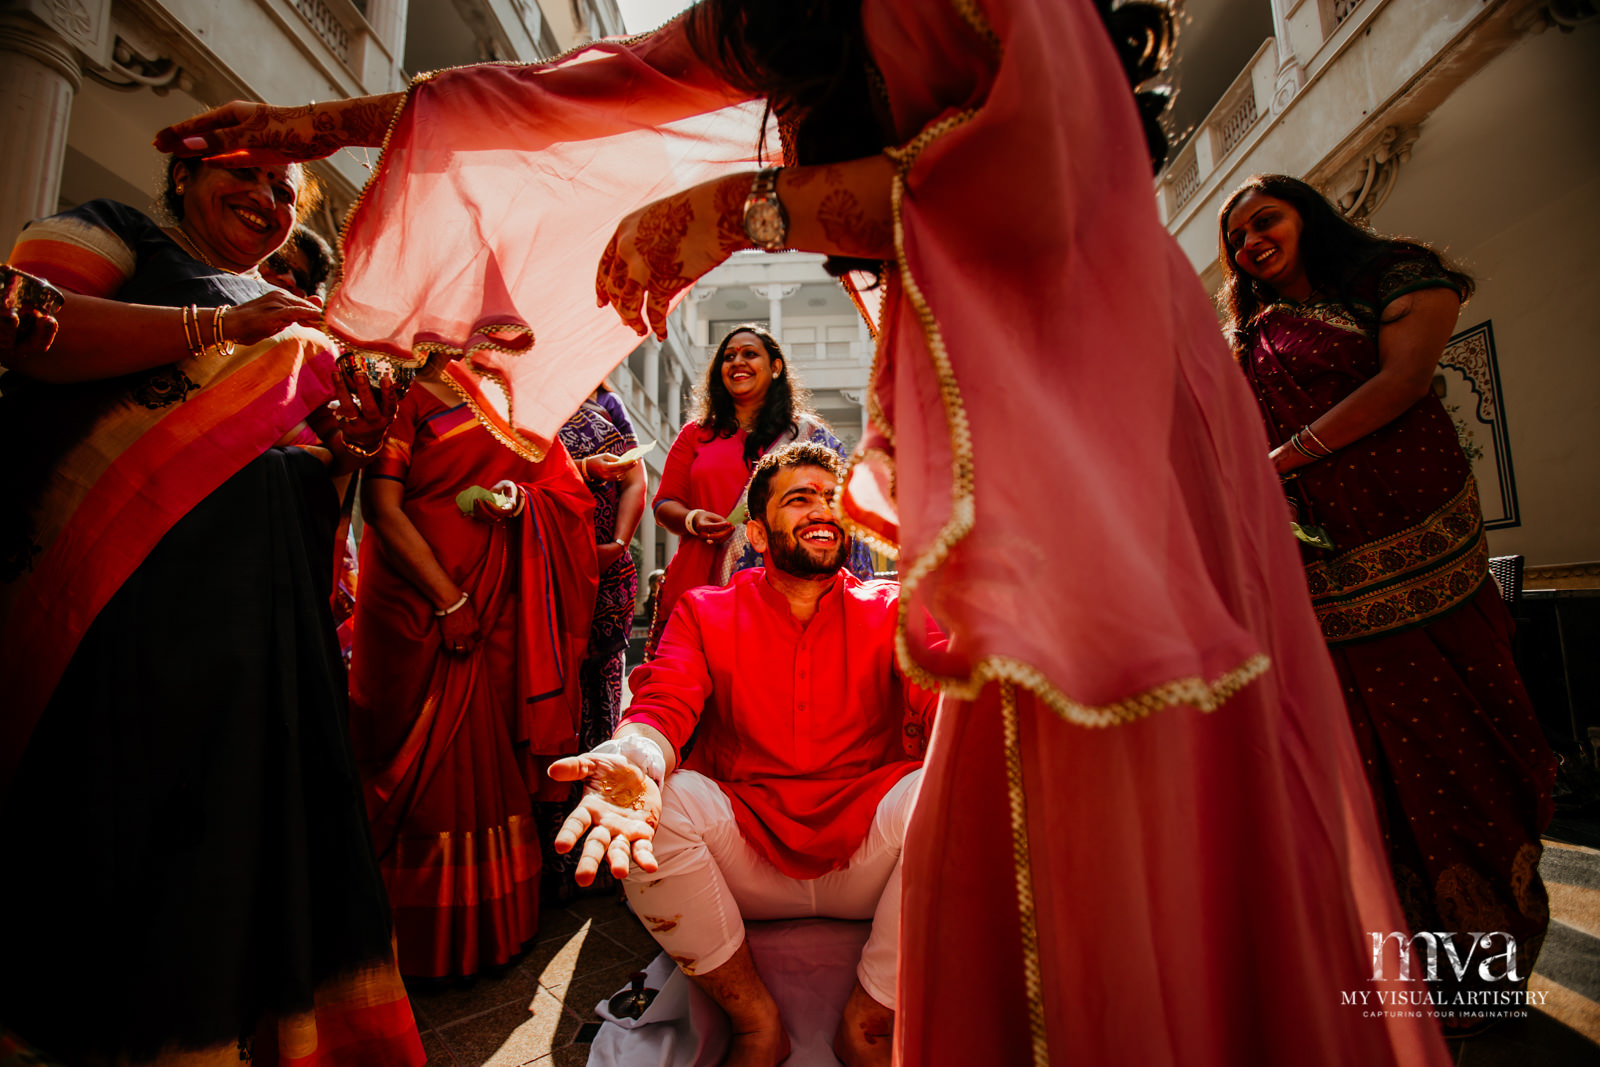 0729 -Vani_Sarang_ Photographer_My Visual Artistry_Wedding_MVA_Destination-8729.jpg